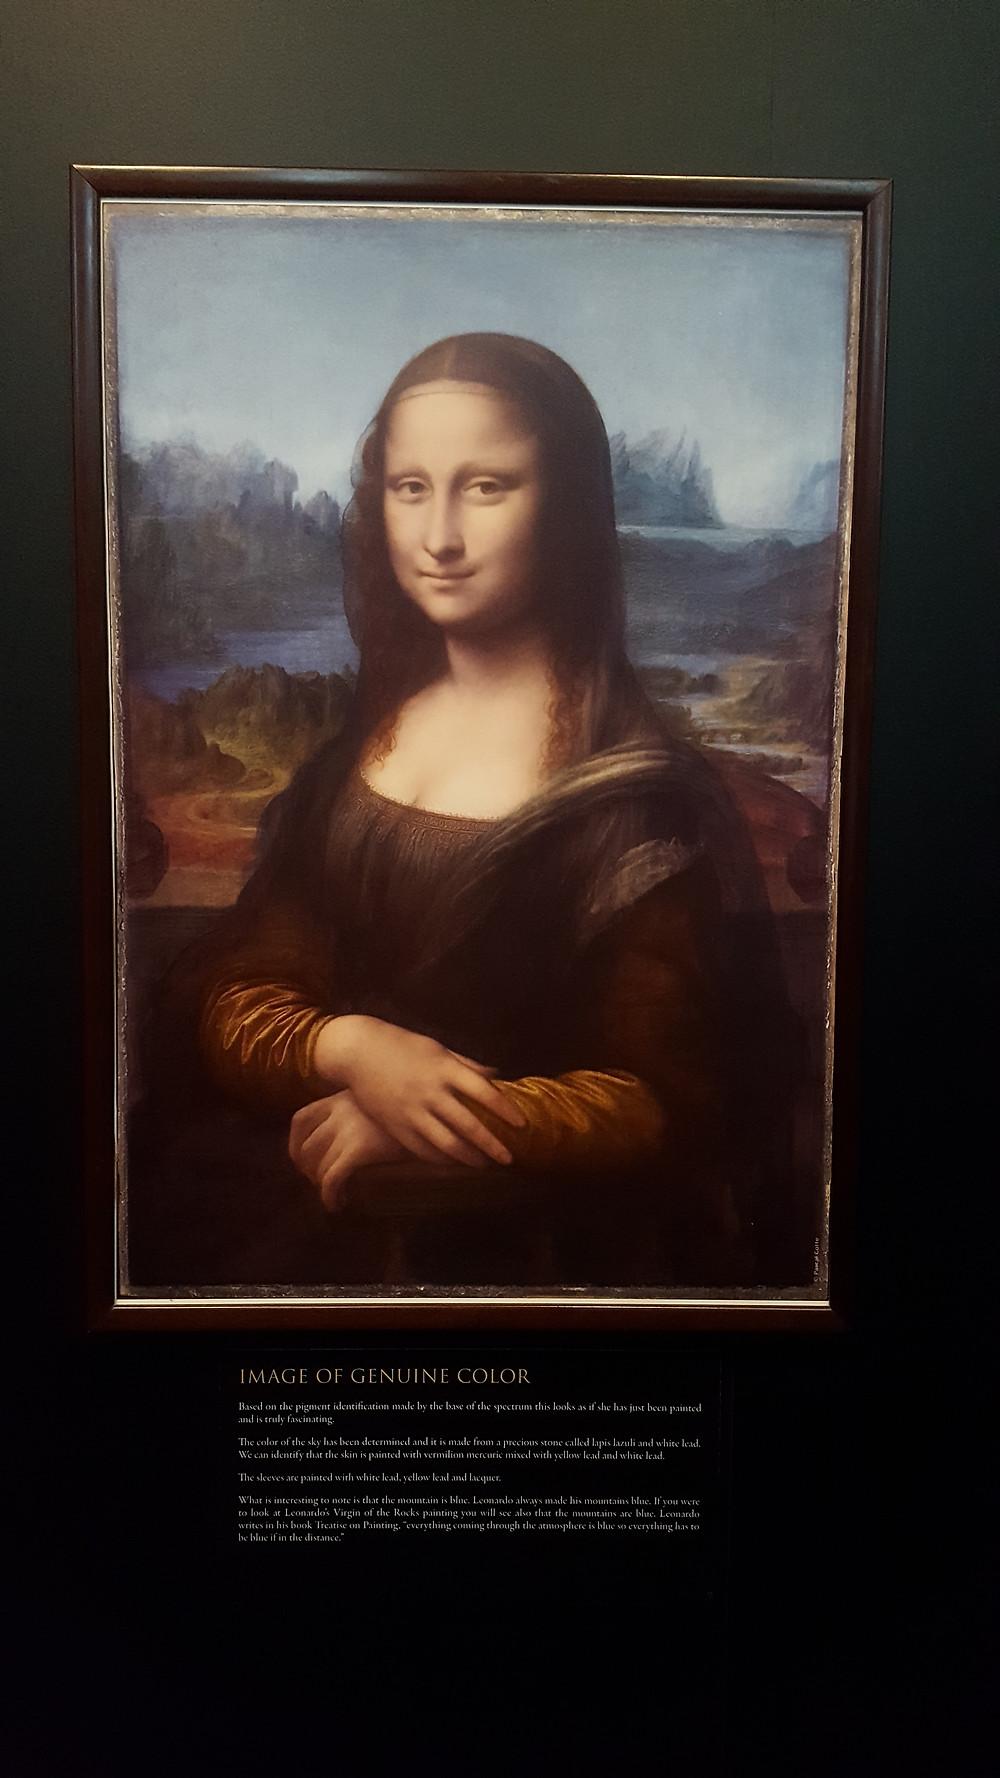 Color real de la Mona Lisa